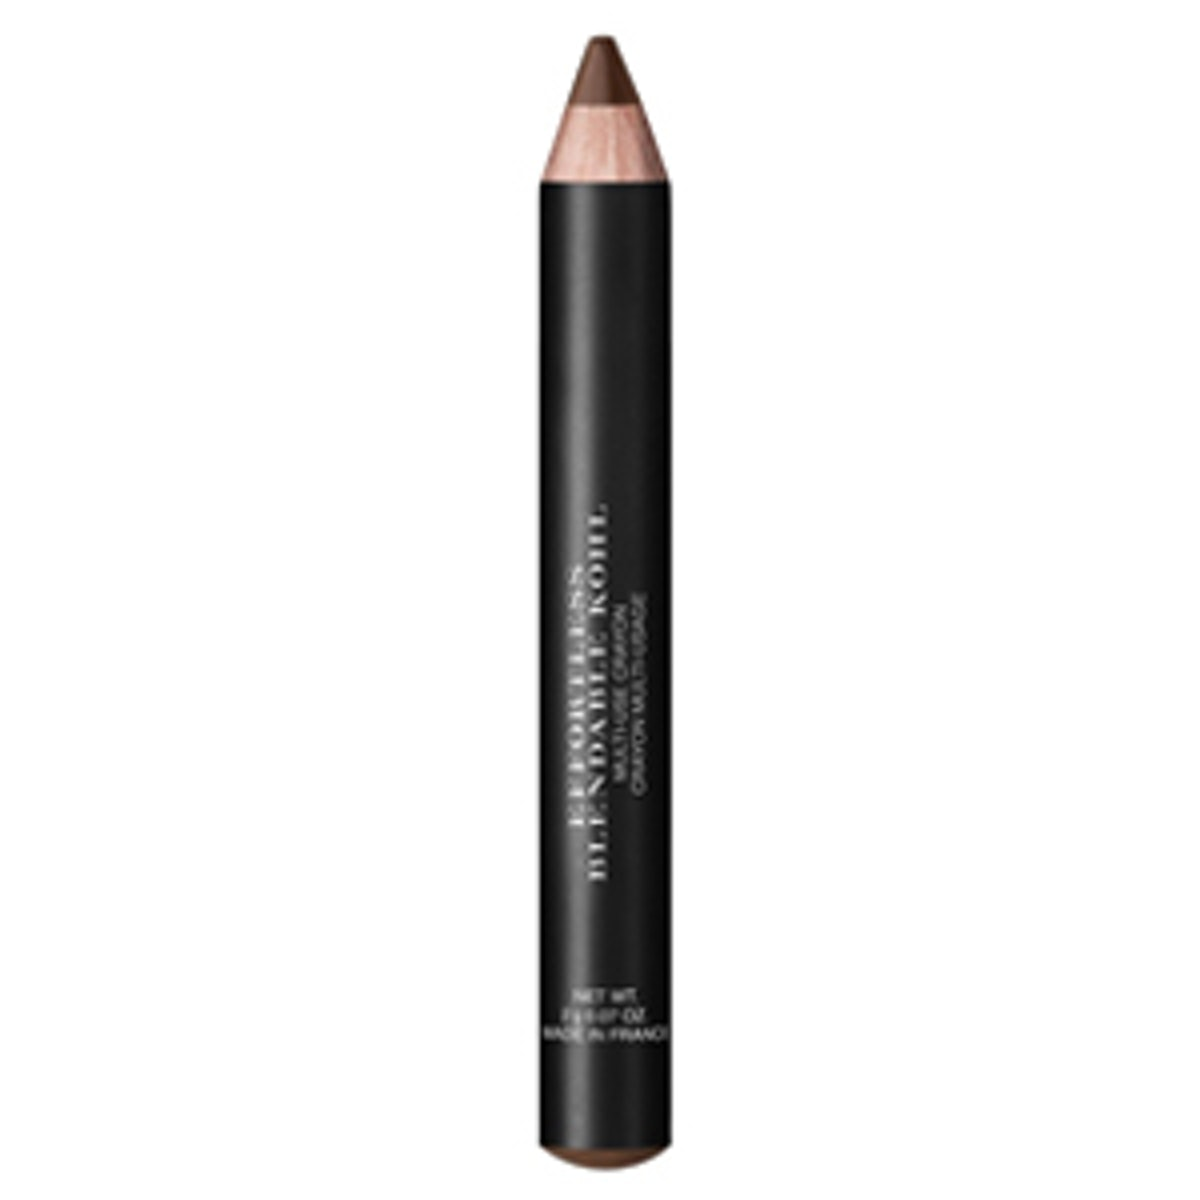 Effortless Blendable Kohl Multi-Use Pencil